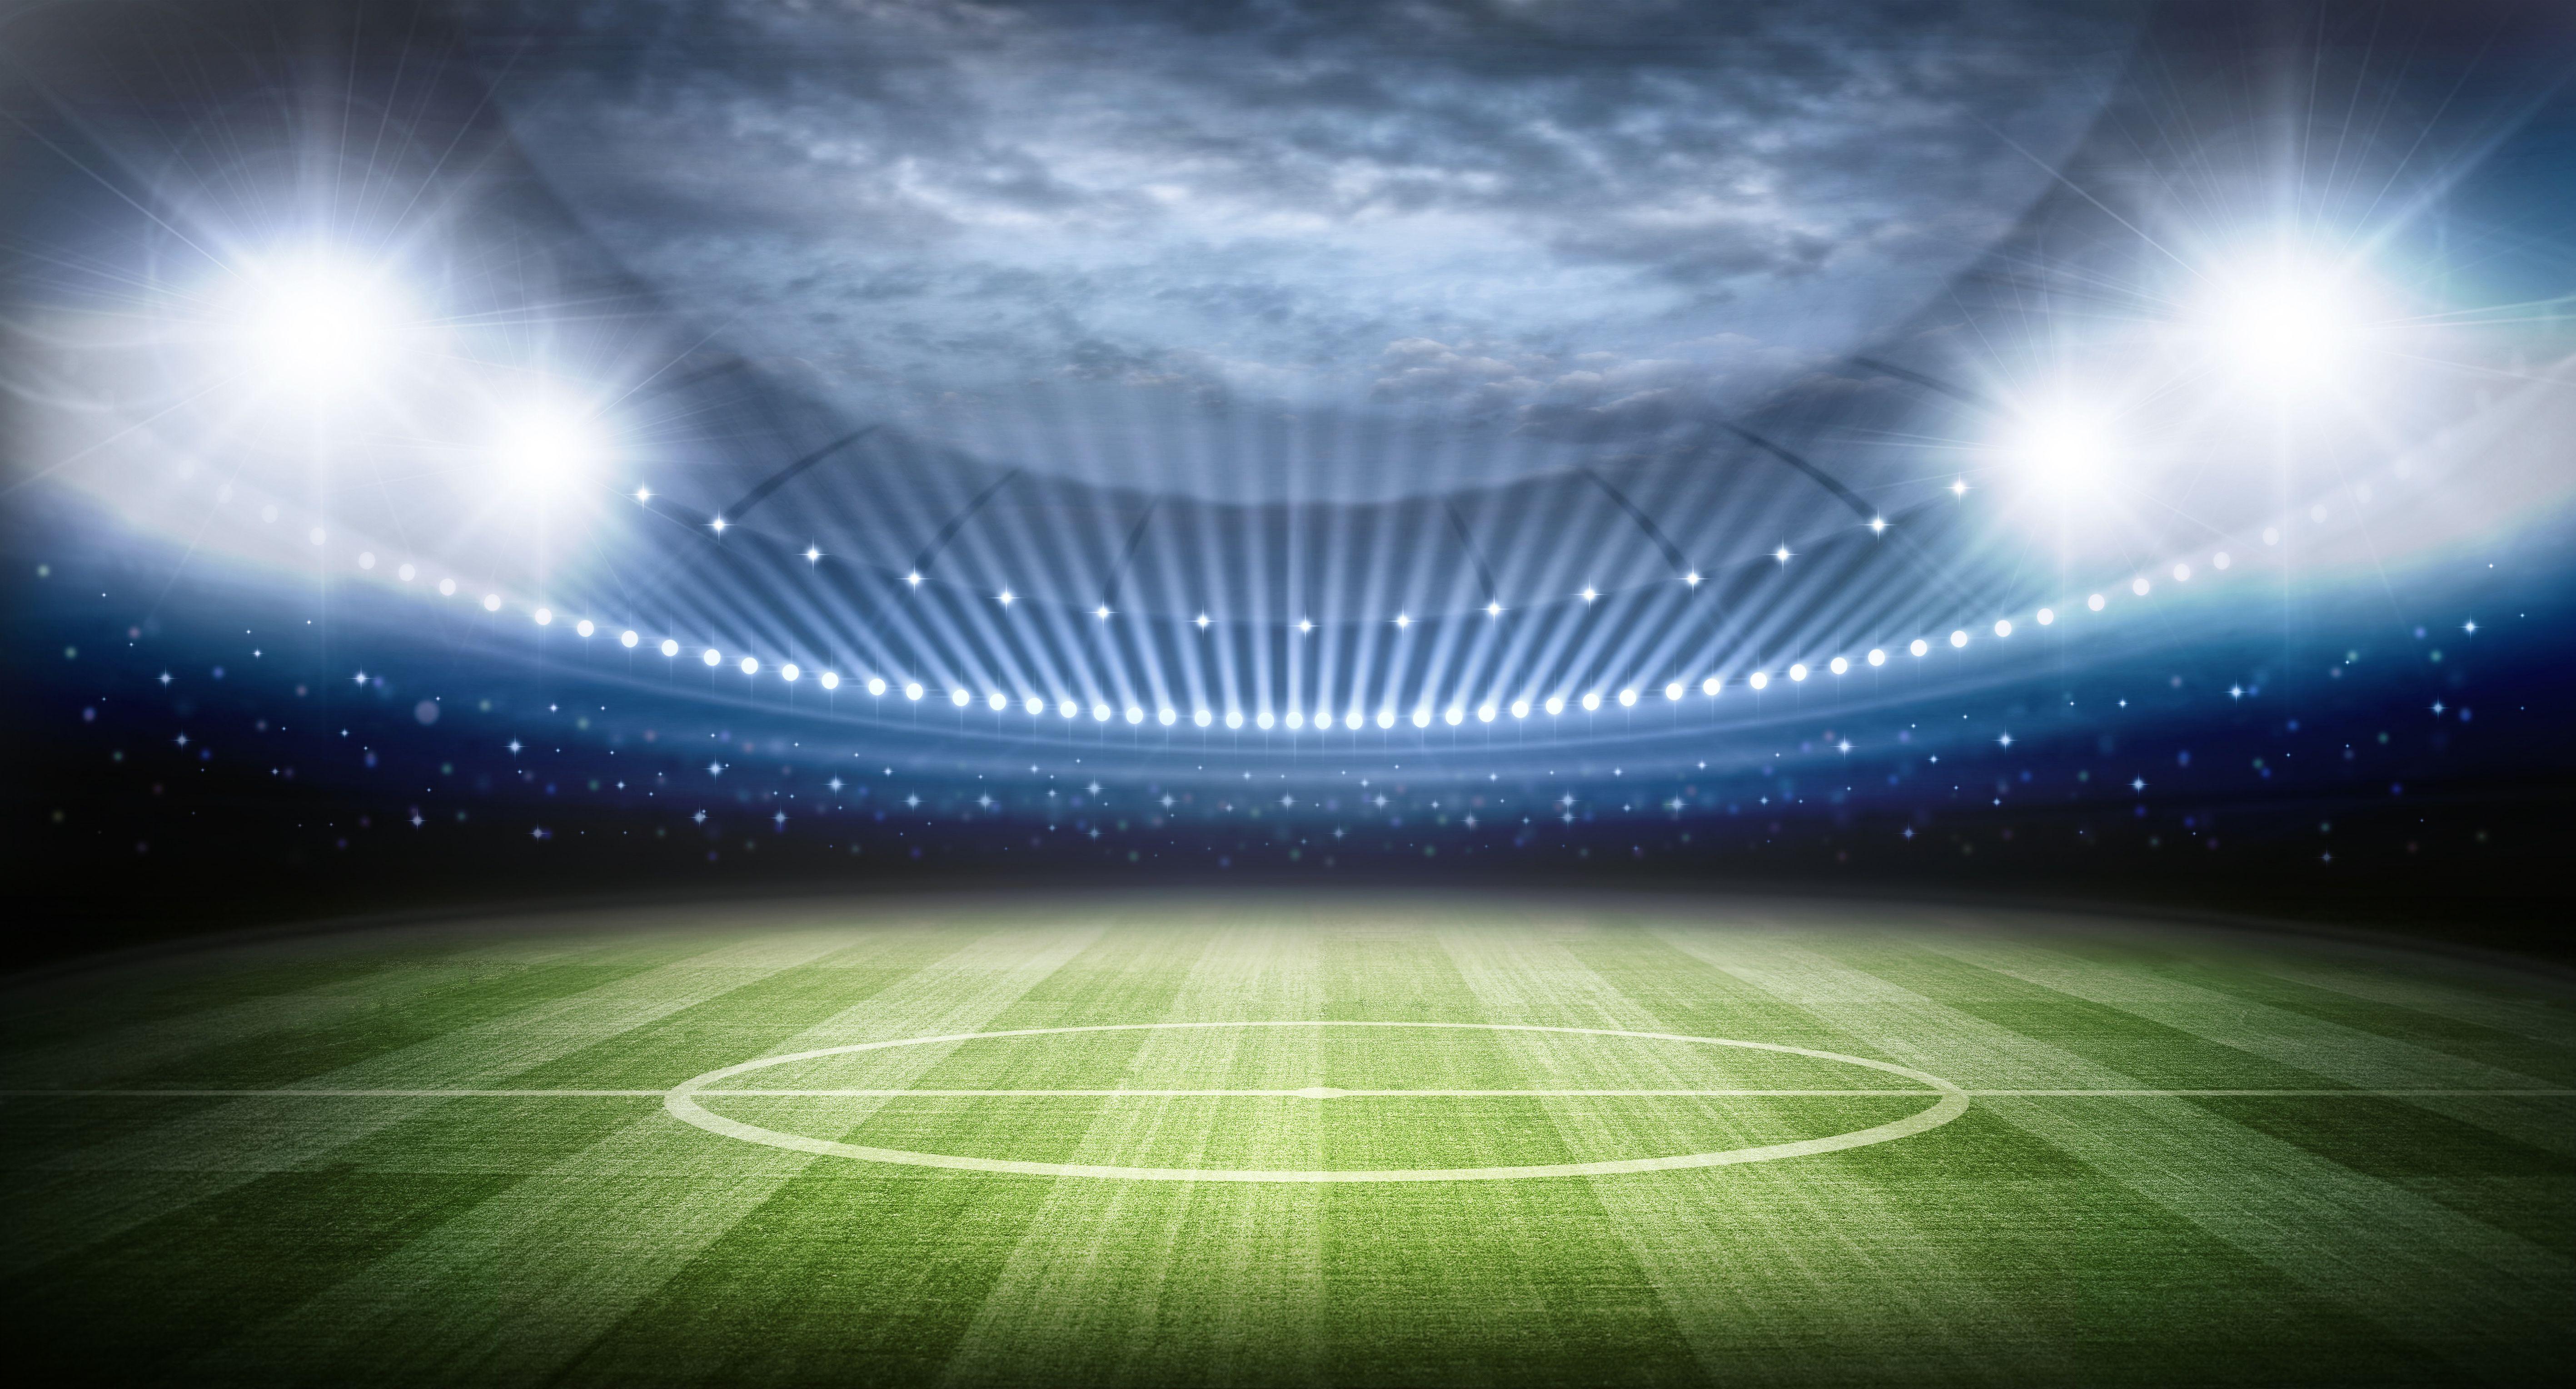 Open Air Football Stadium Lights Shining Air Football Football Stadiums Stadium Lighting